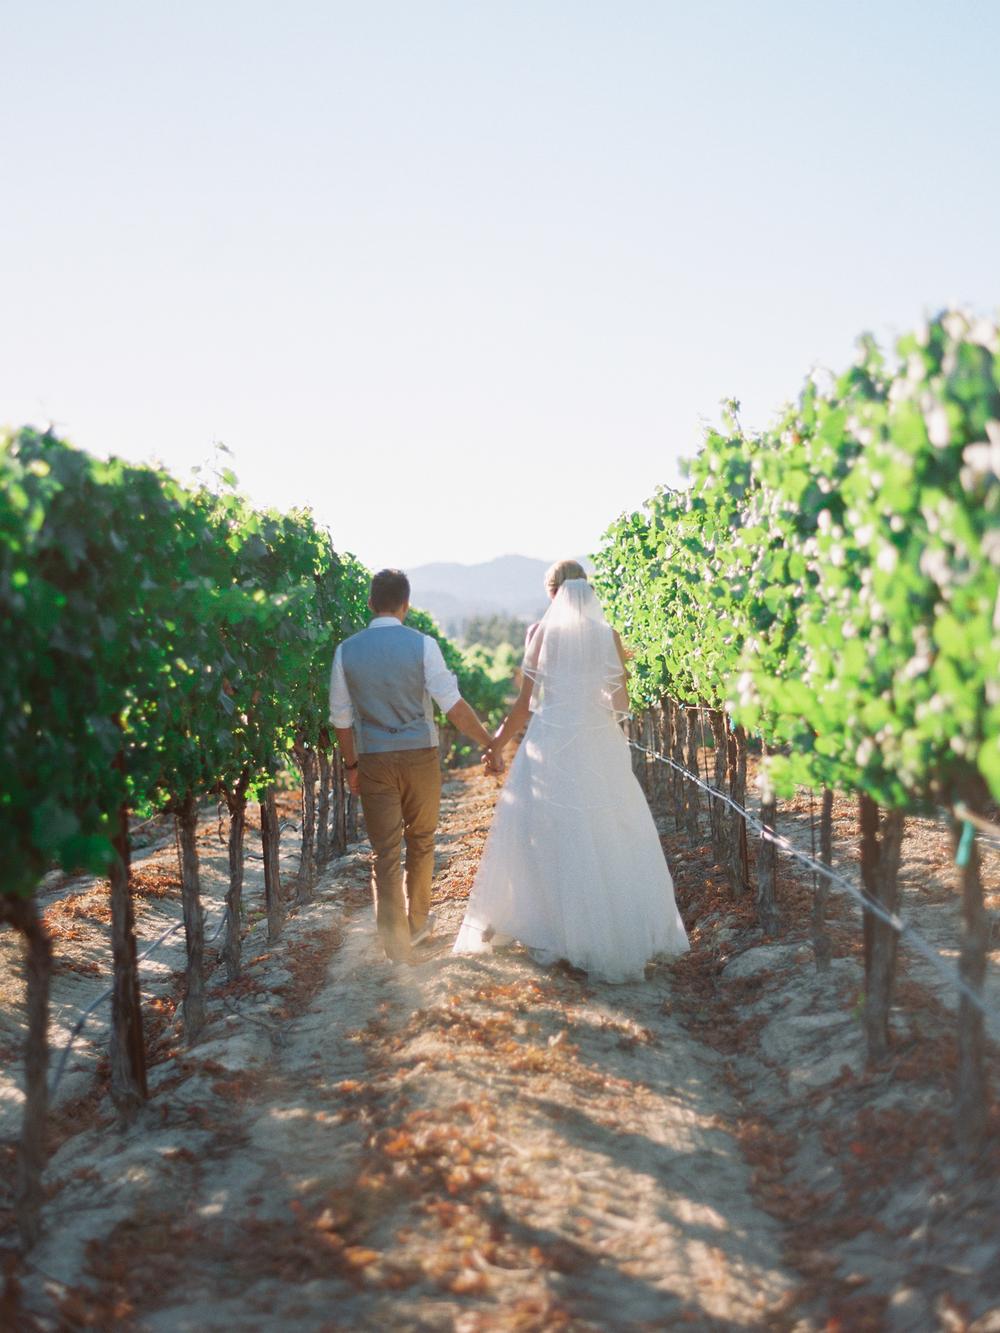 Anders Wedding by Jessica Garmon-375.JPG